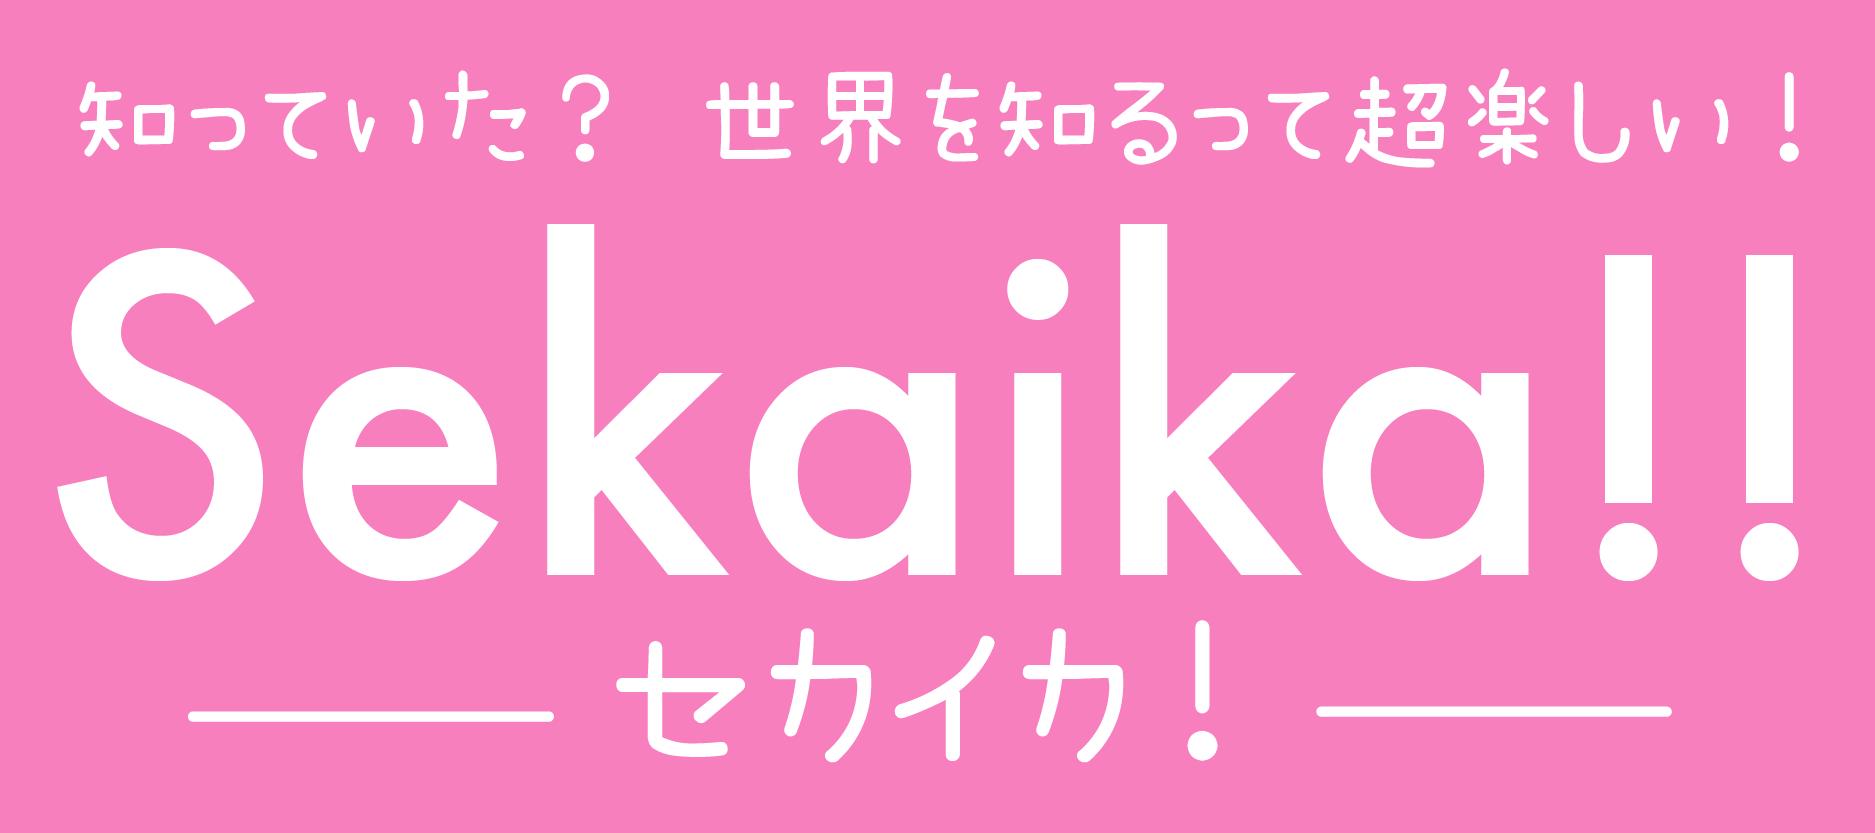 Sekaika!![セカイカ!]